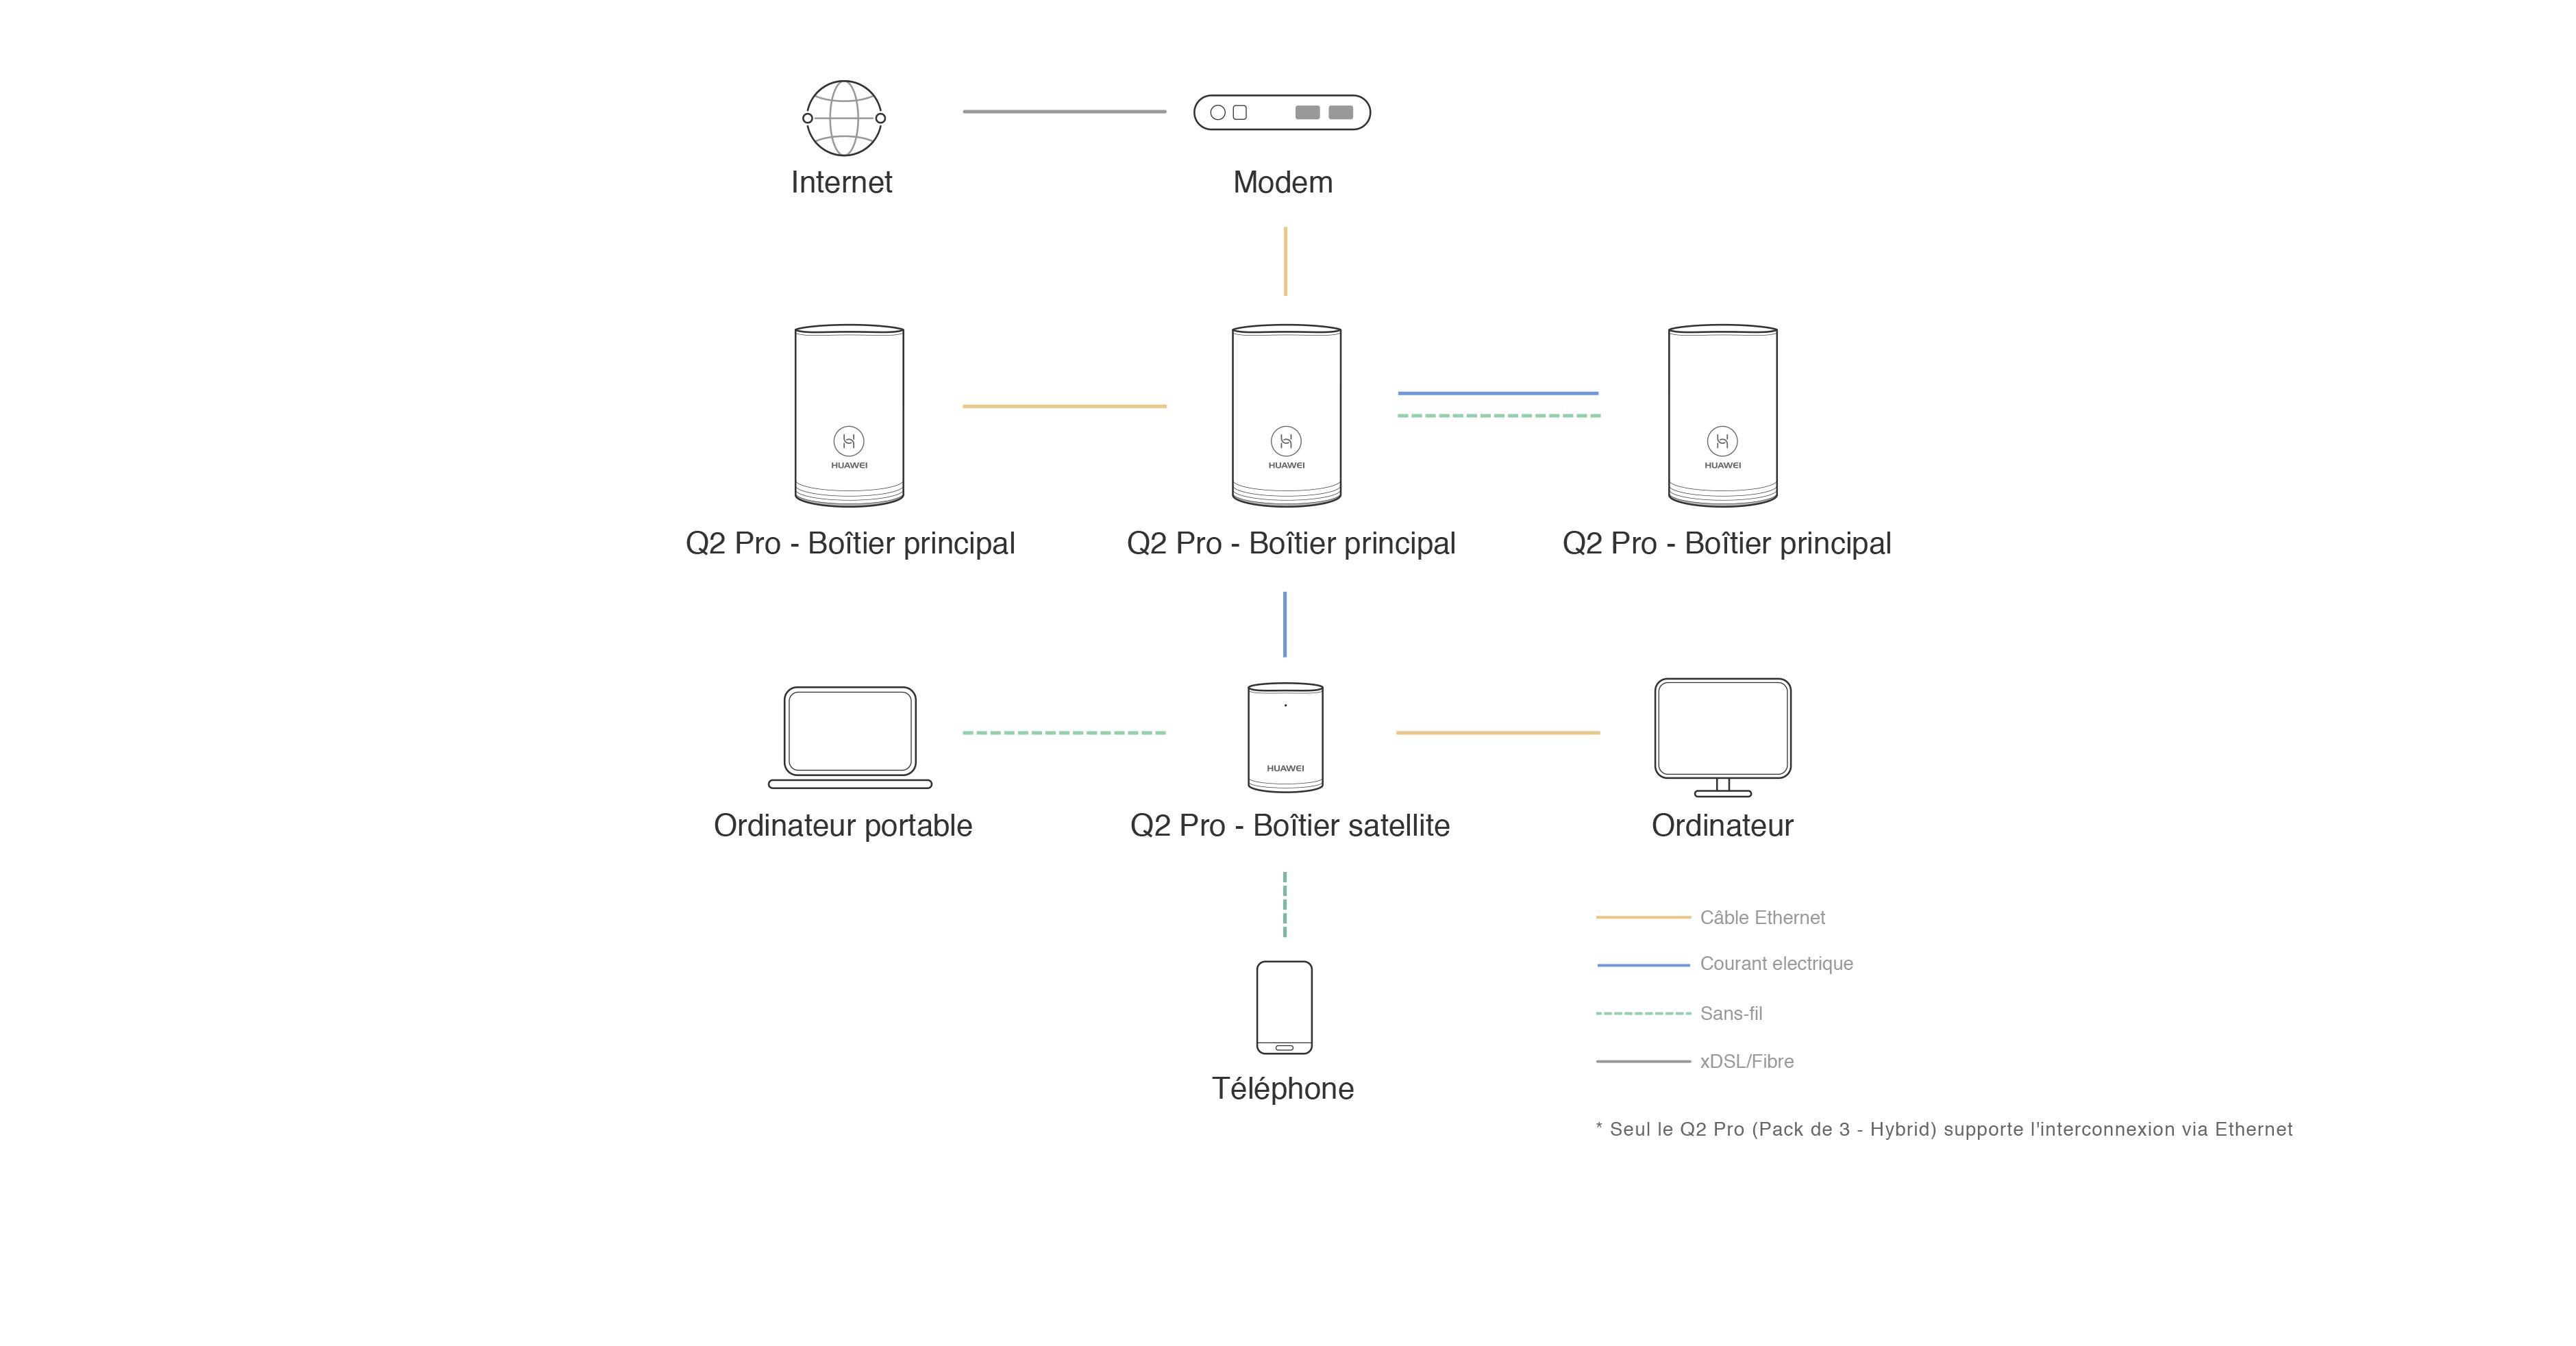 https://consumer.huawei.com/content/dam/huawei-cbg-site/weu/fr/mkt/pdp/smart-home/q2-pro-3pack/3760/pc-3760-4.jpg